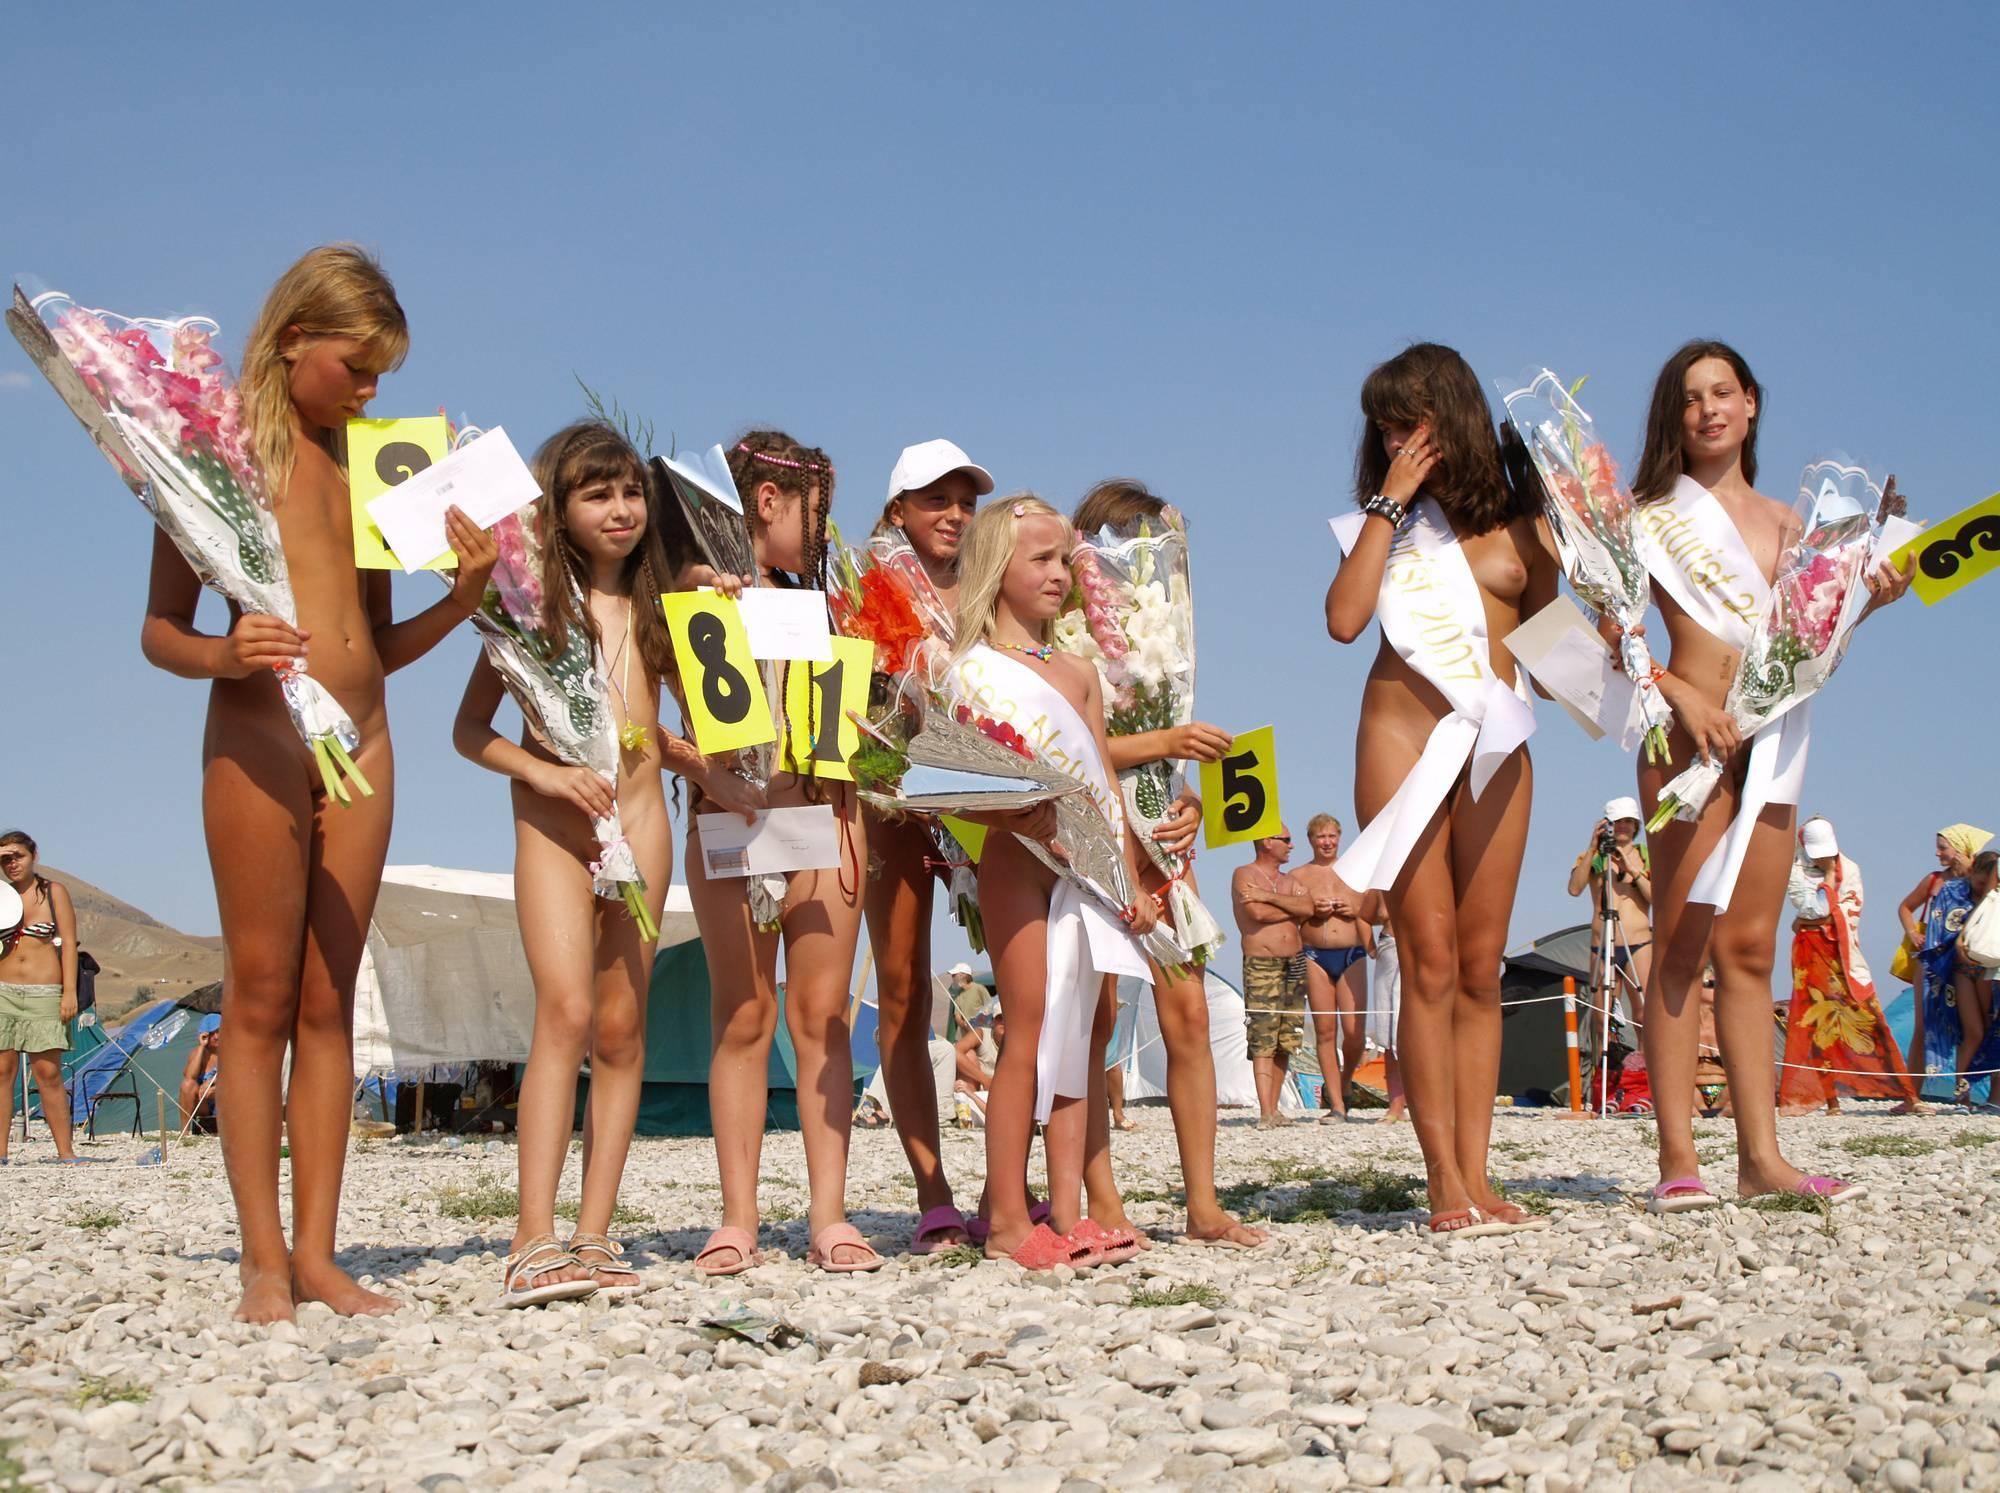 Pure Nudism Gallery-Nude Jr Kids Pageant - 4